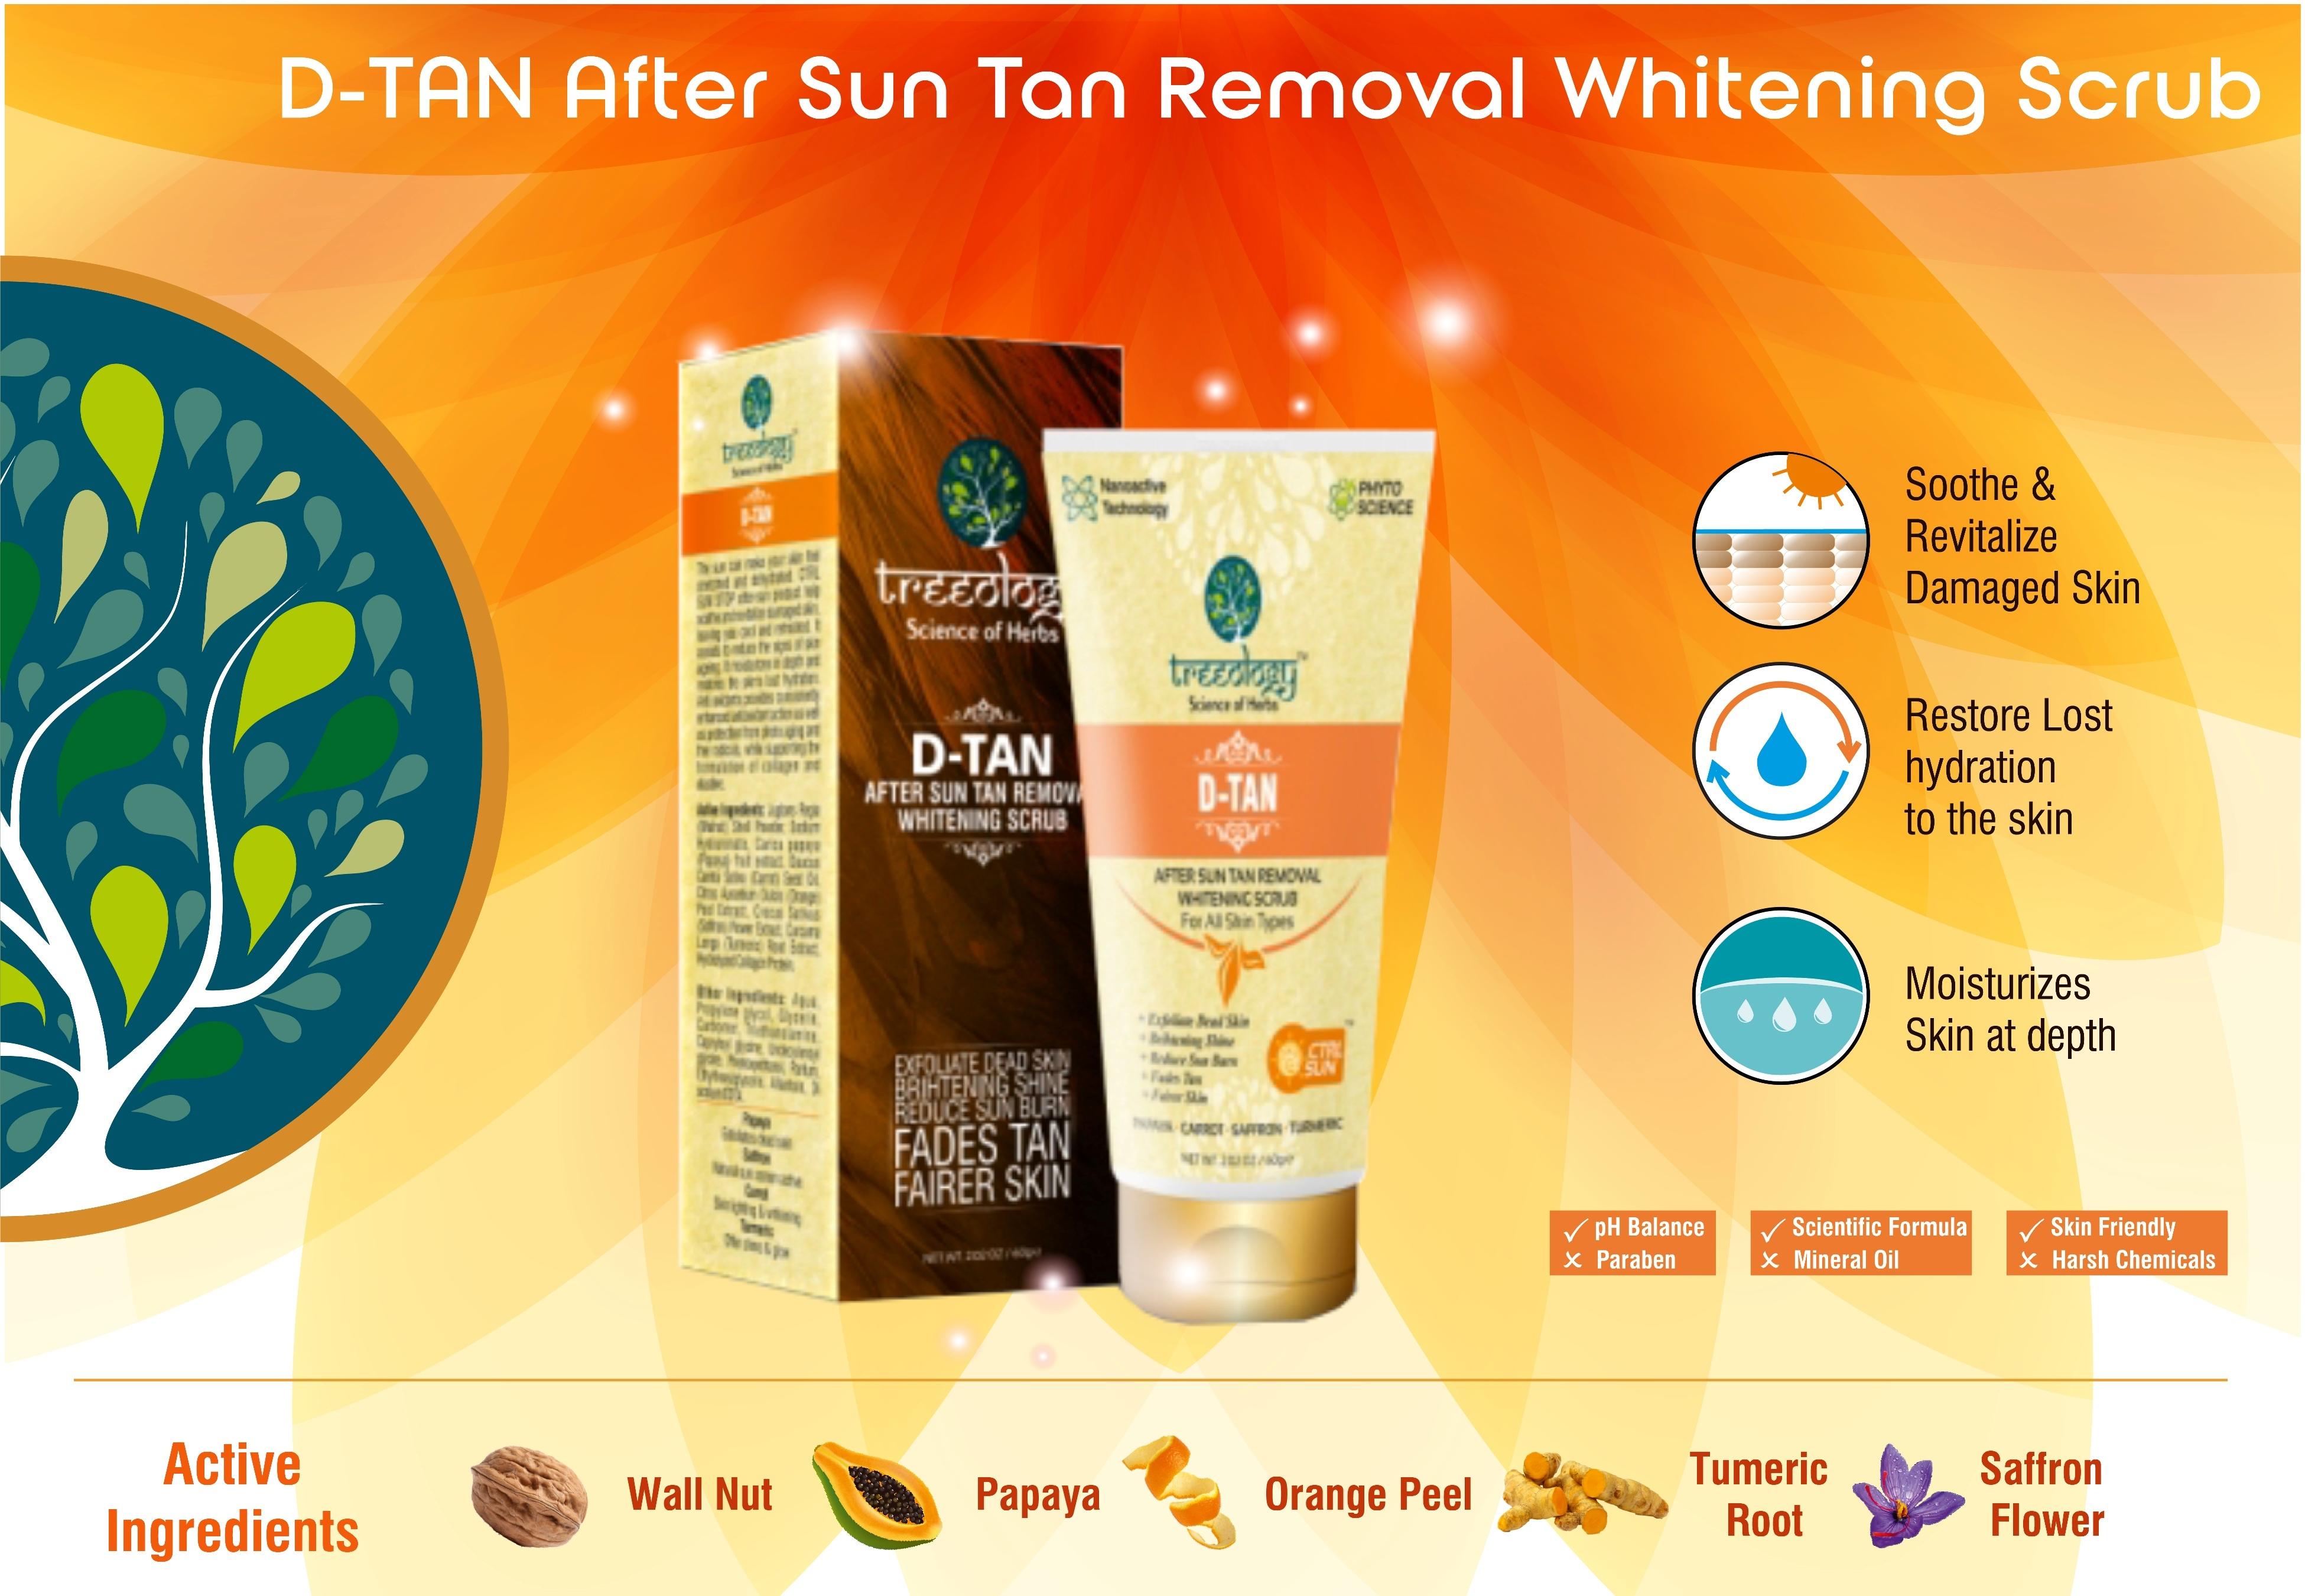 Herbal Tan Removal Scrub